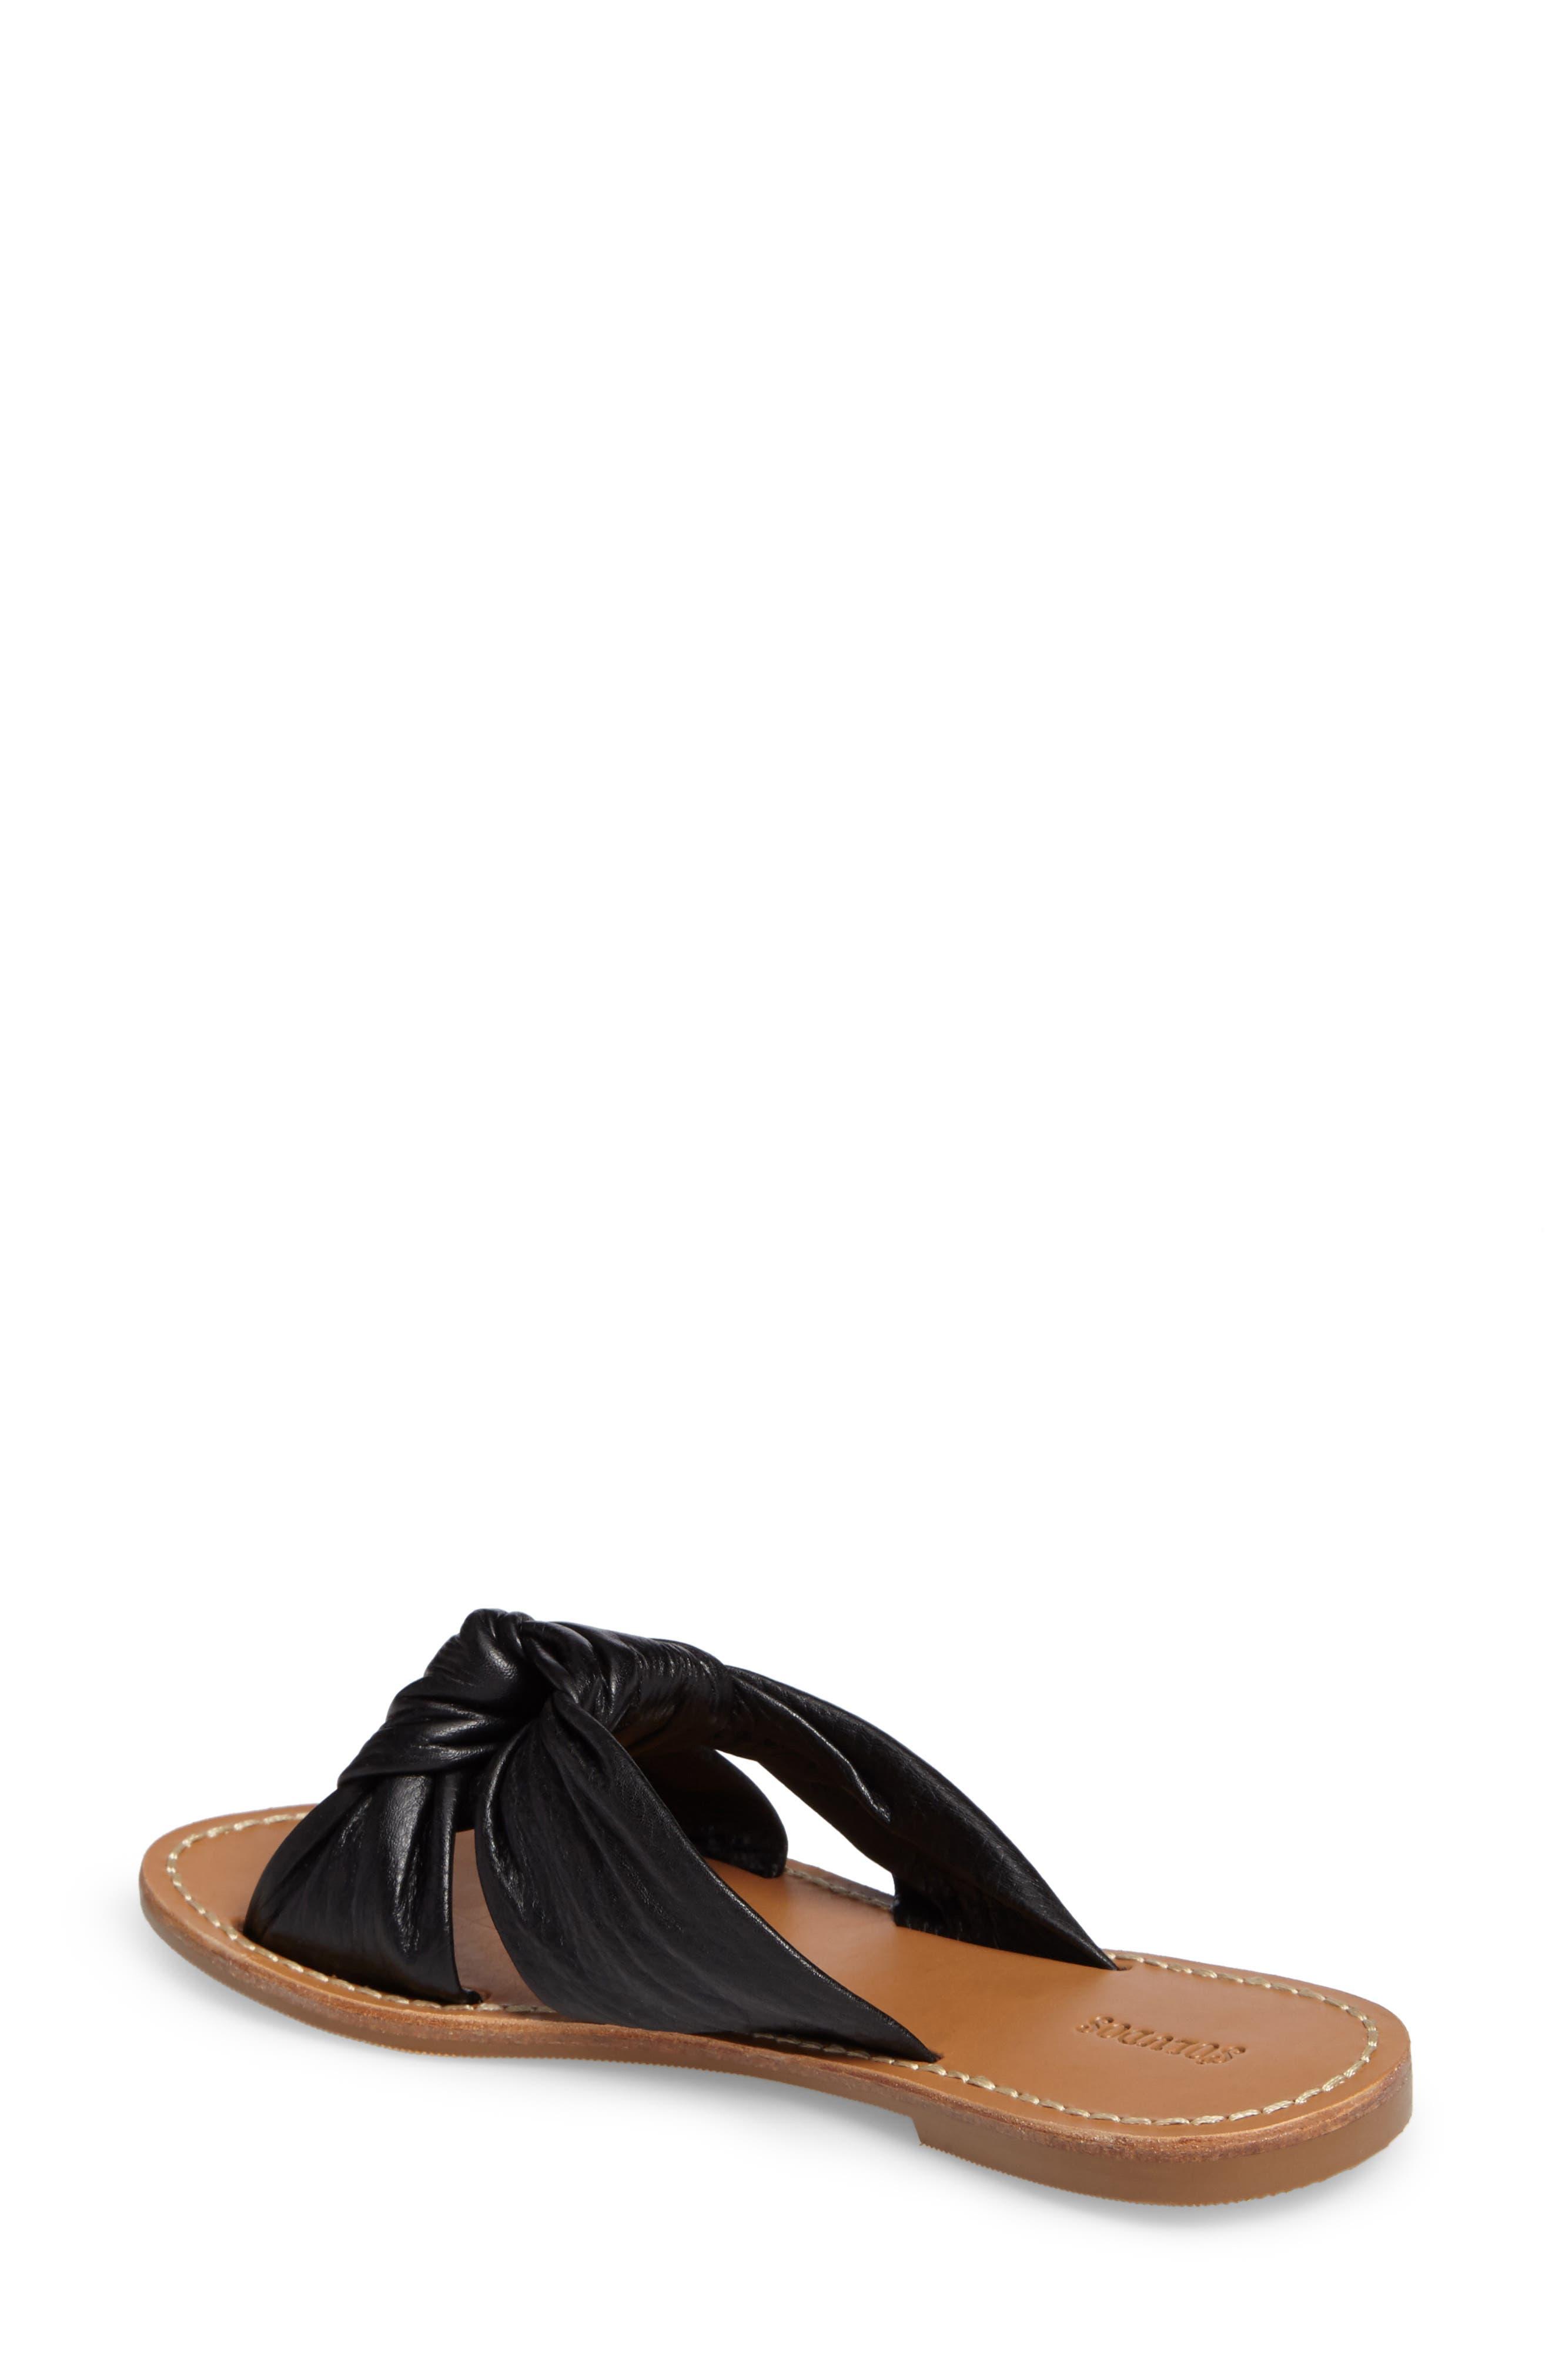 Knotted Slide Sandal,                             Alternate thumbnail 2, color,                             001